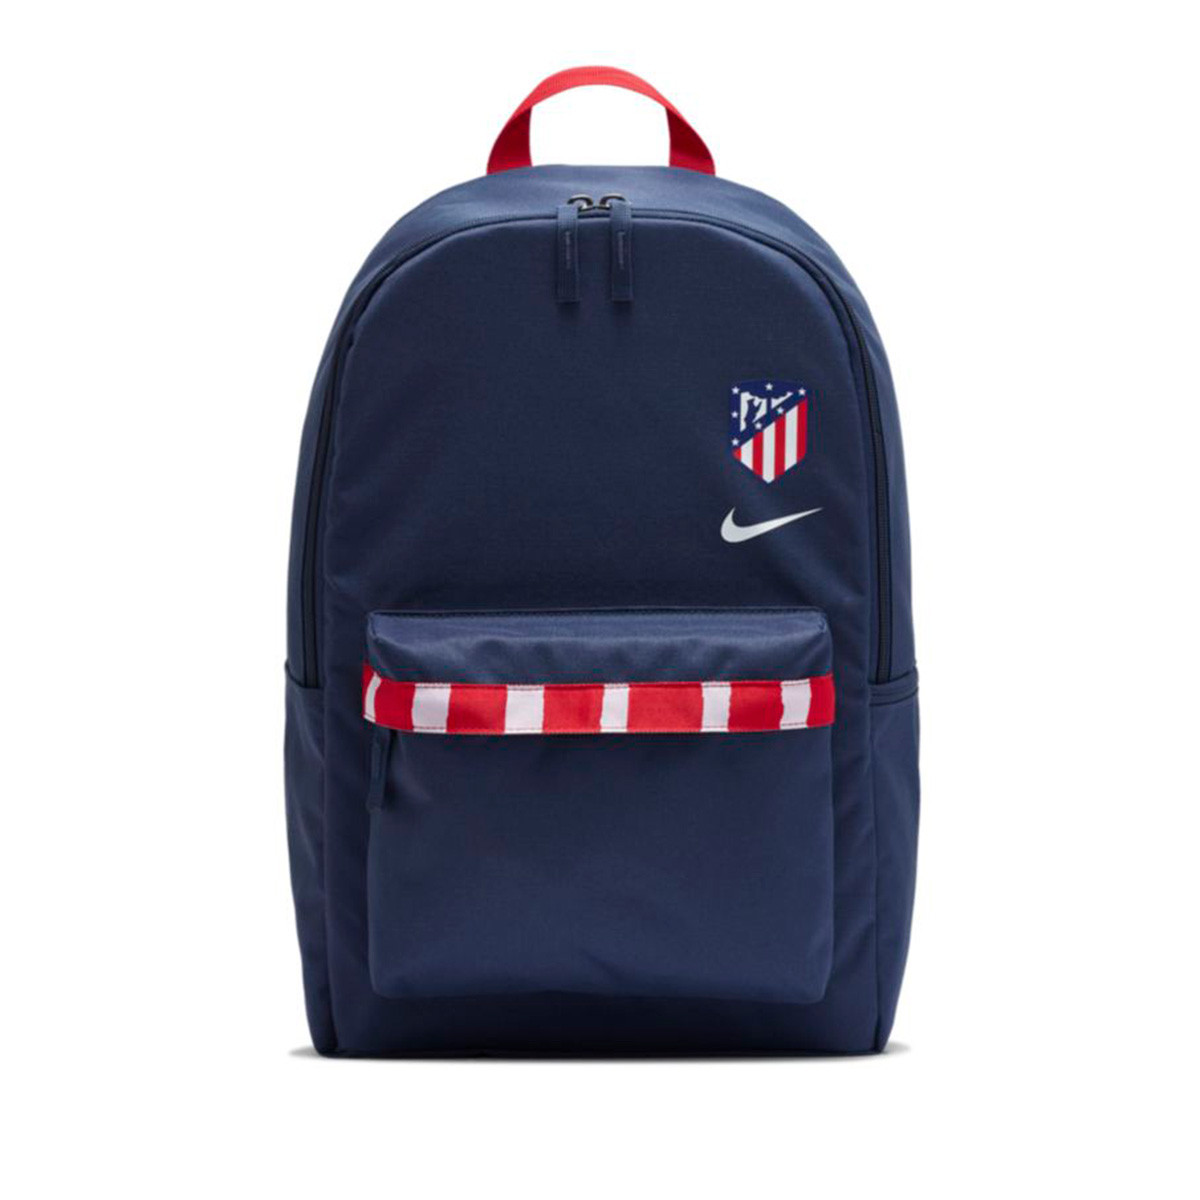 estimular solo oportunidad  Mochila Nike Atlético de Madrid Stadium 2020-2021 Midnight navy-Sport  red-White - Tienda de fútbol Fútbol Emotion